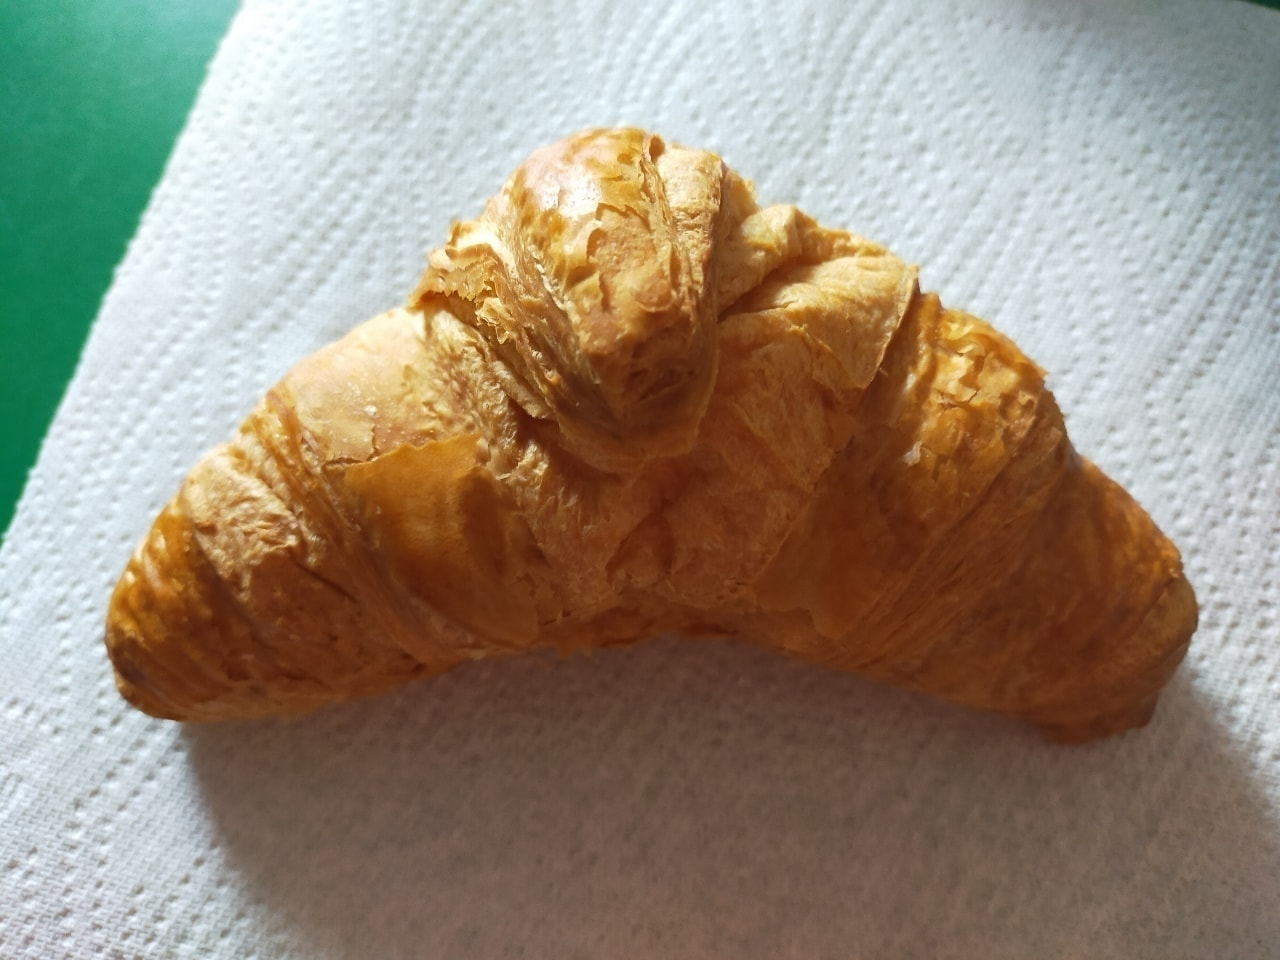 Tesco croissant